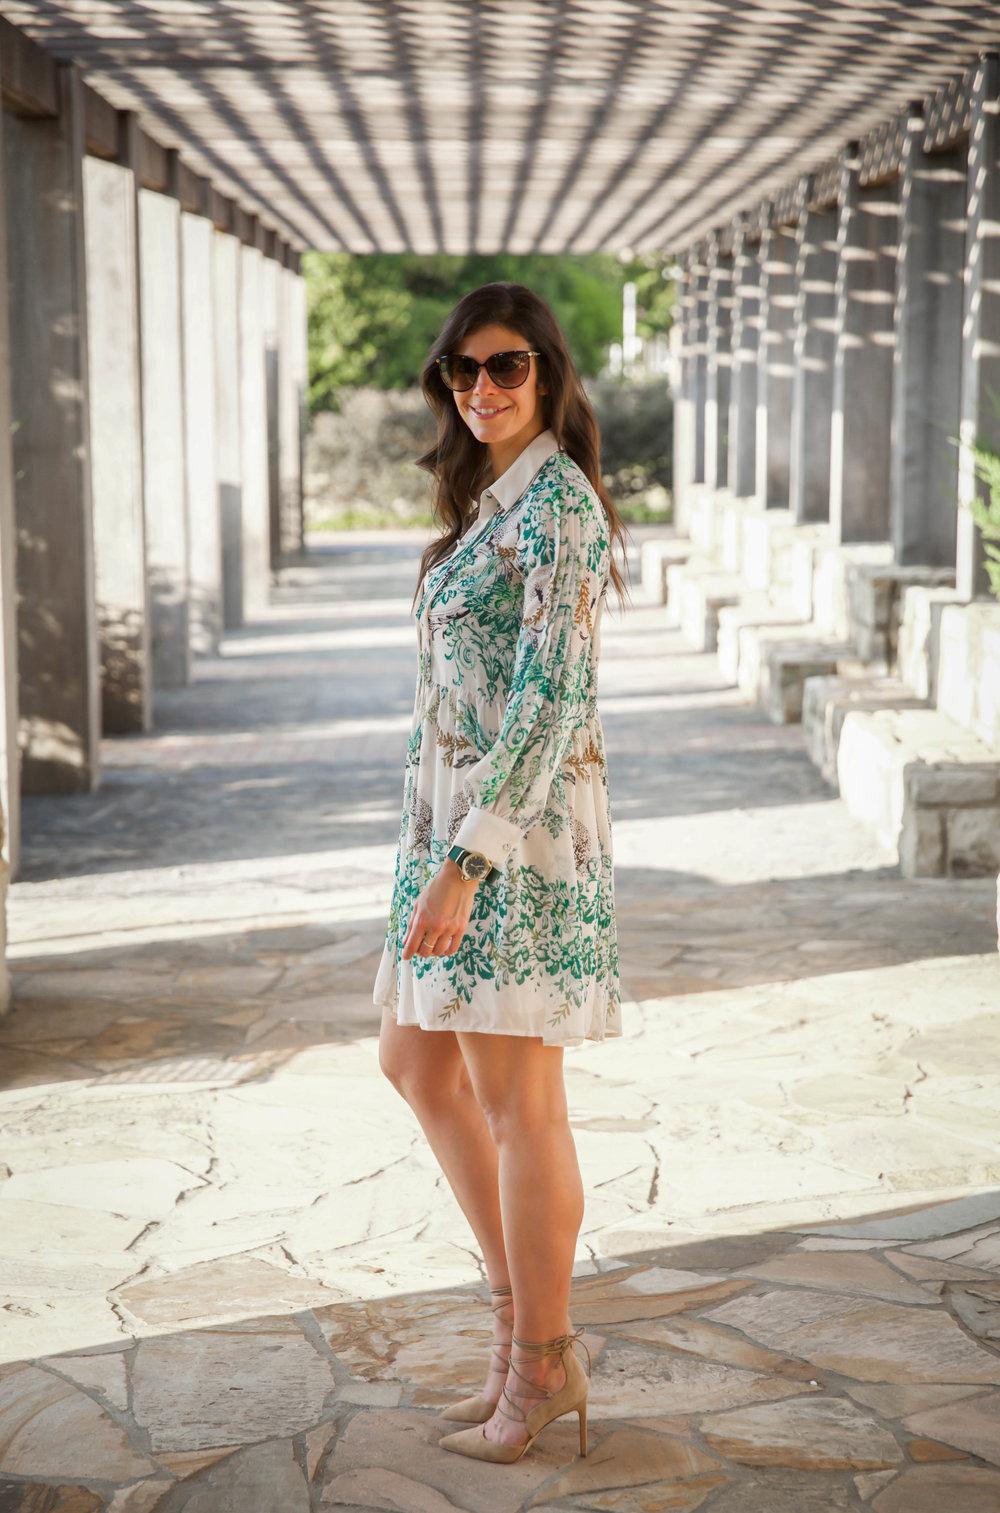 sophisticated-shirtdress-anthropologie-fall-florals-lauren-schwaiger-style-blog.jpg